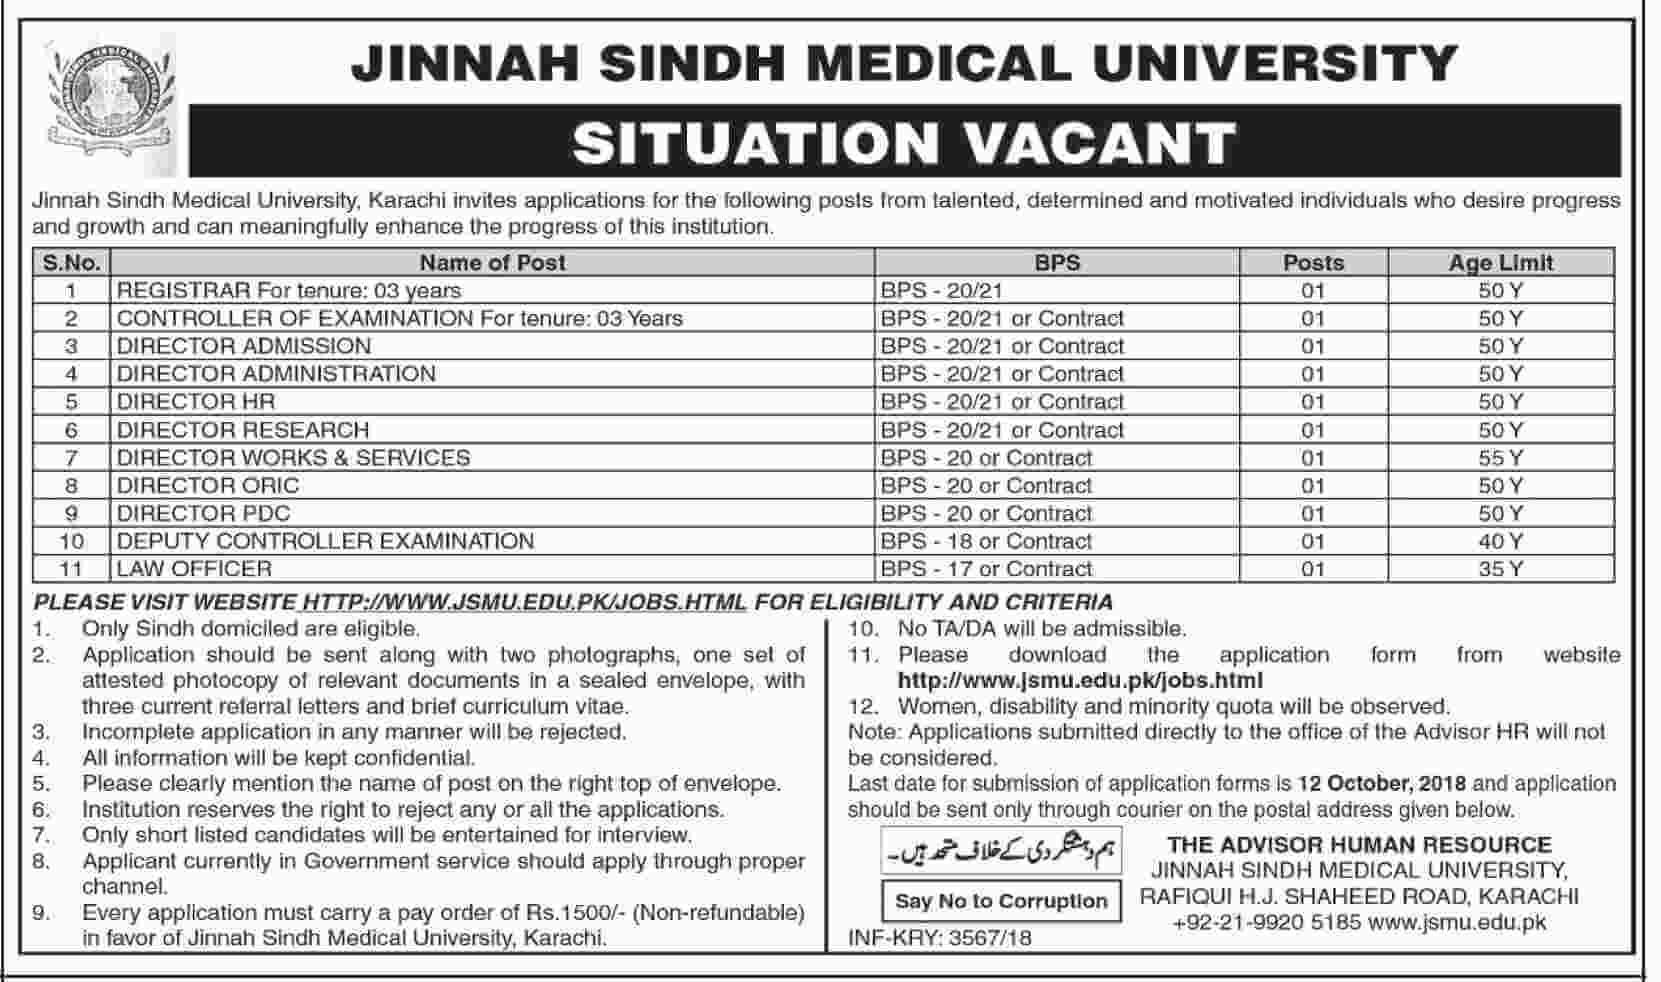 Jinnah Sindh Medical University Latest Jobs 2018 Government Jobs-thumbnail